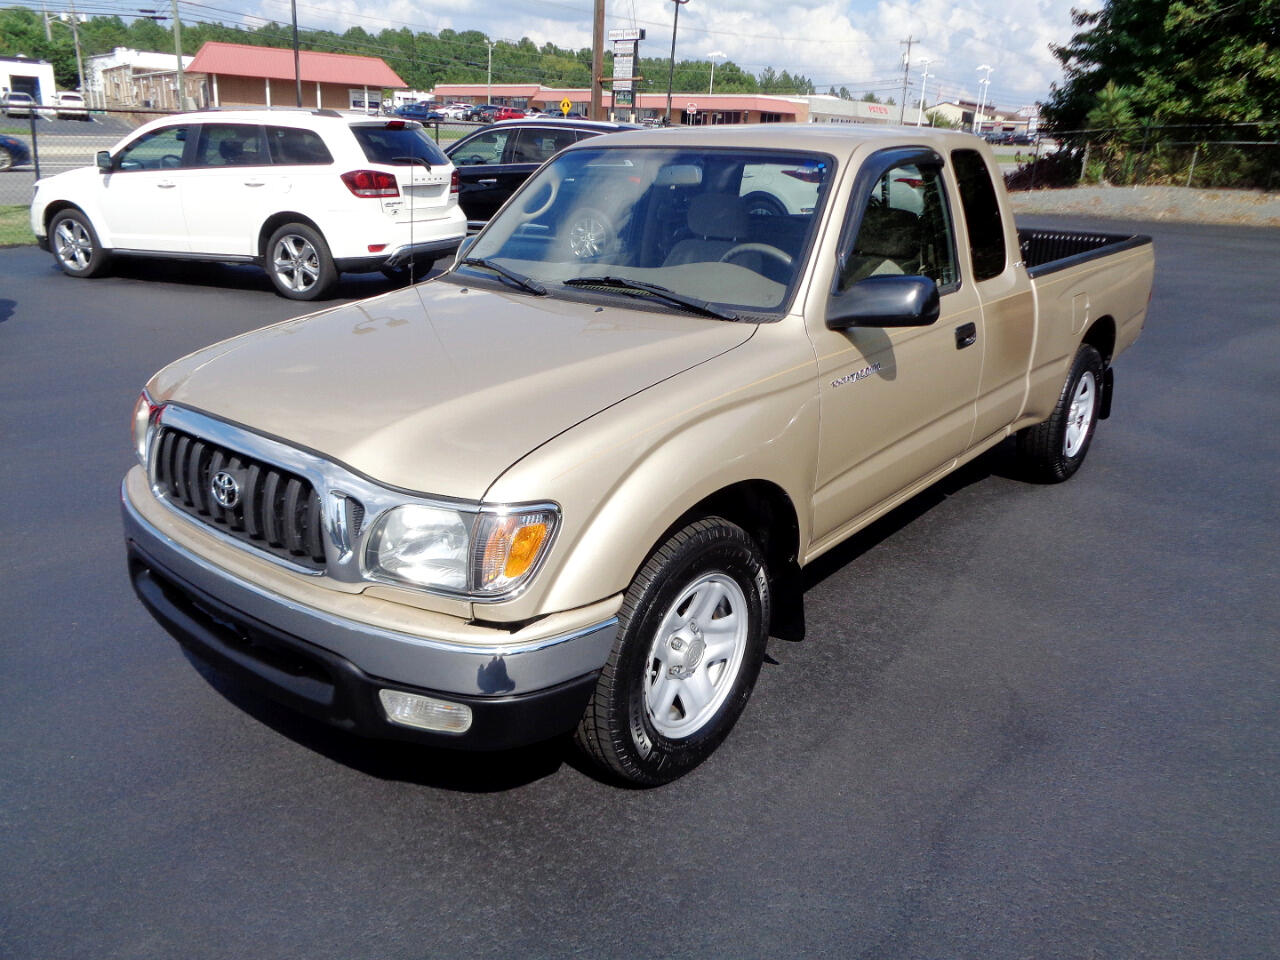 2003 Toyota Tacoma Xtracab 2WD